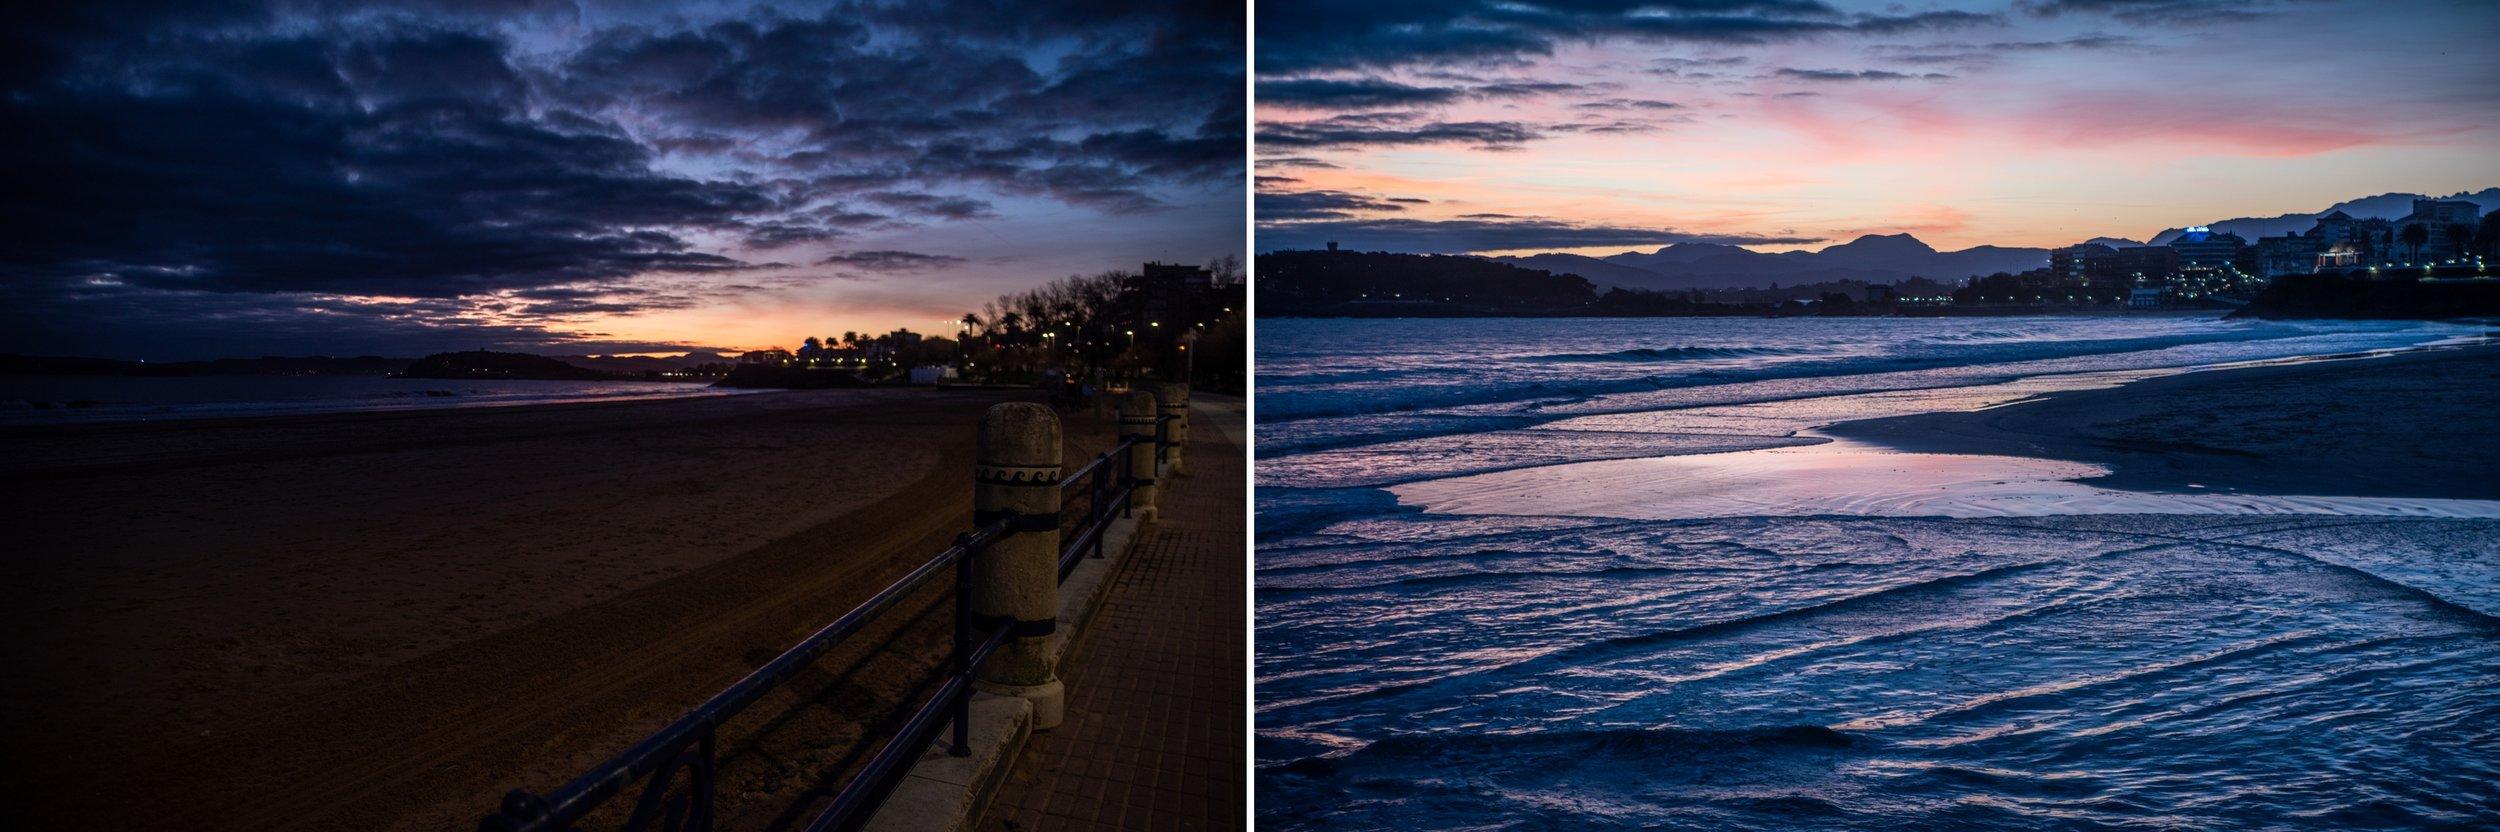 35mm Film Photography from San Sebastian, Spain